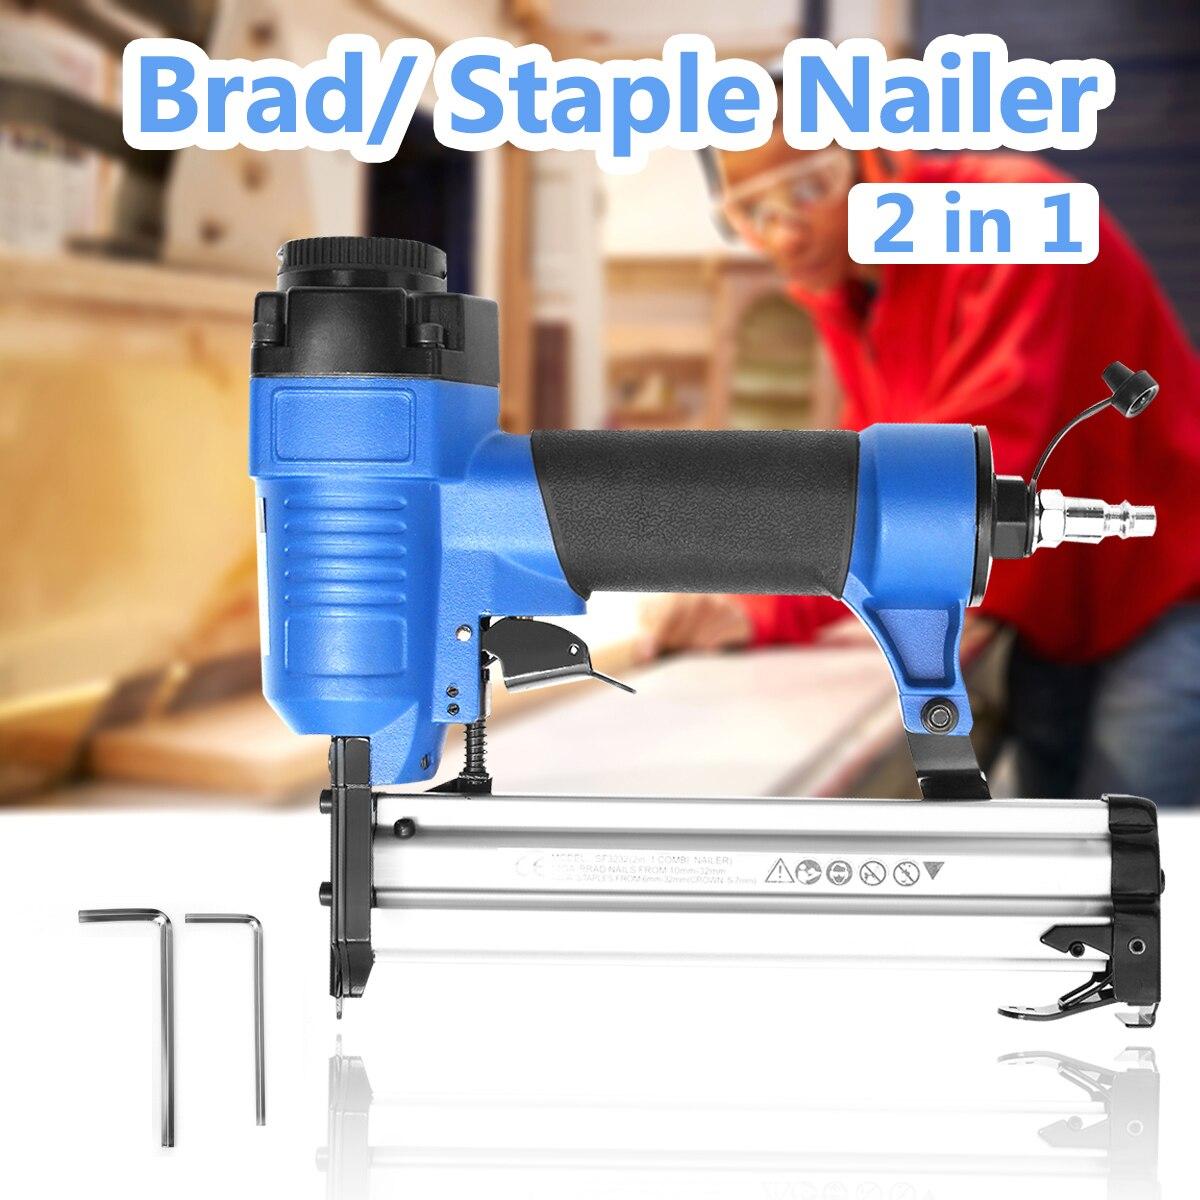 цена на 10-32mm 2 in1 Mini Air Staple Nailer Gun Electric Tacker SF3232 Brad Nail Gun Furniture Woodworking Stapler Air Power Tools